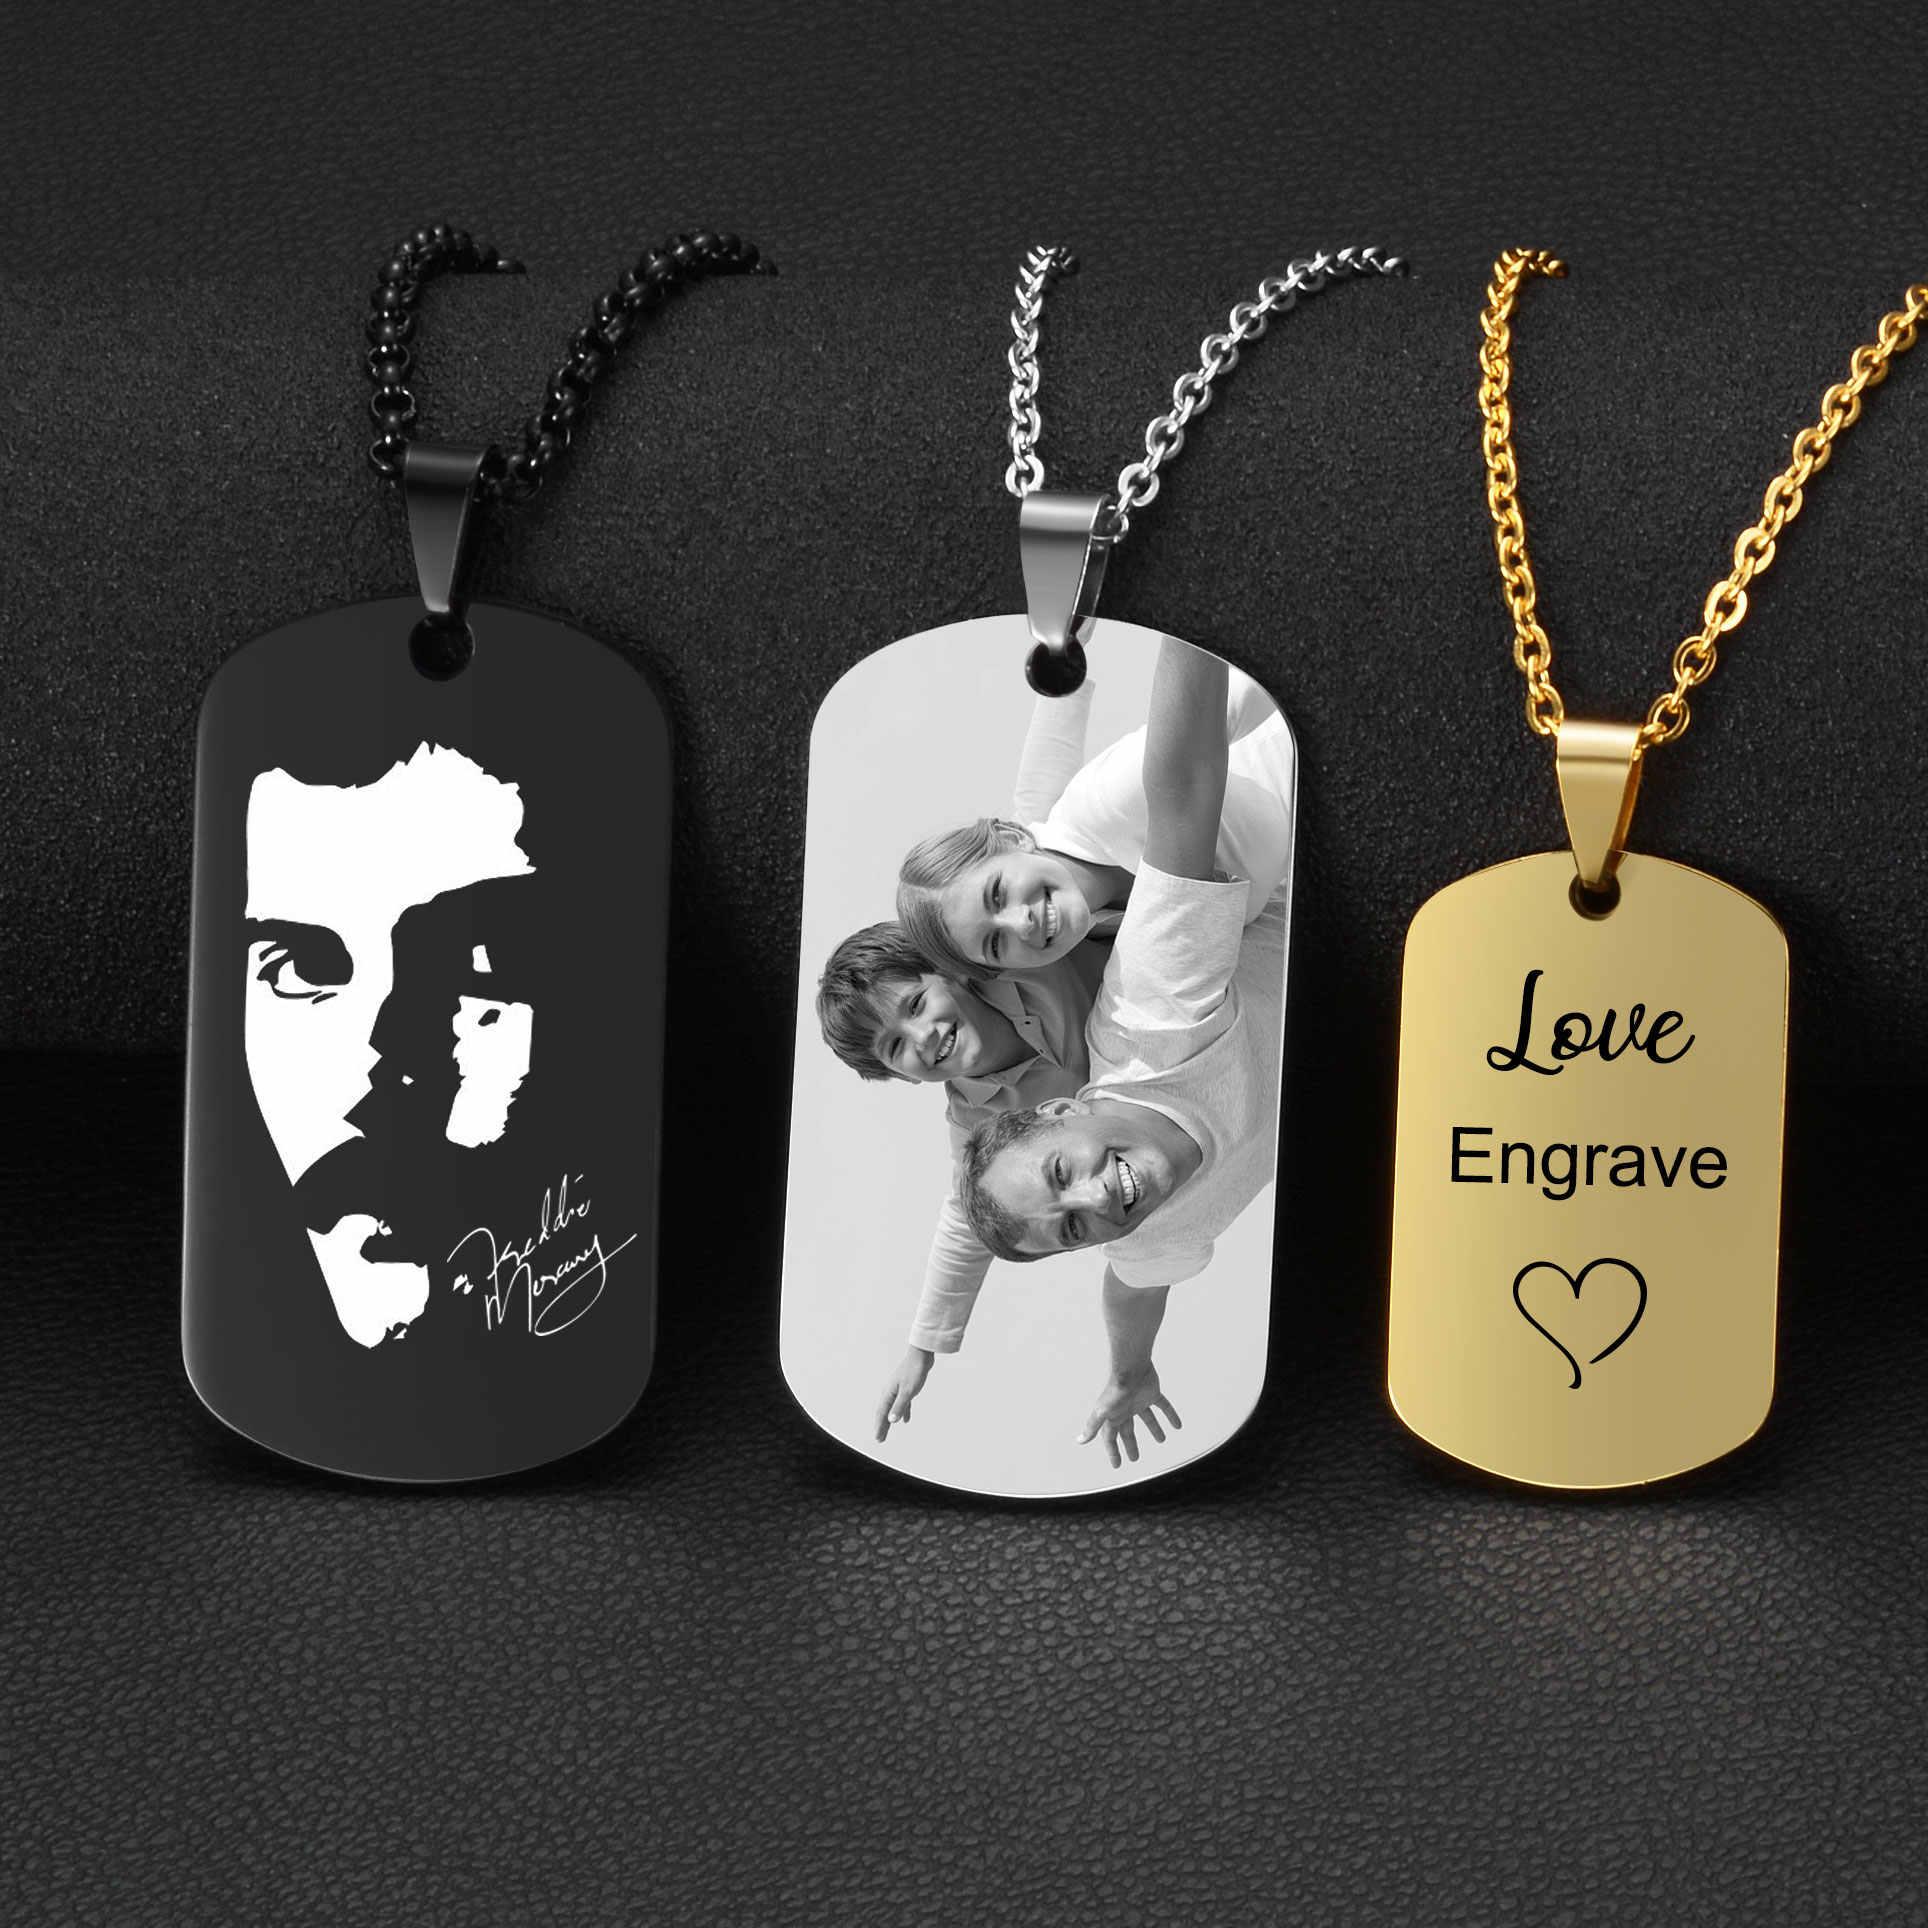 4 Warna Stainless Steel Kustom Terukir Kalung Tentara Anjing: Kalung Personalized Nama ID Memorial Foto Liontin Perhiasan